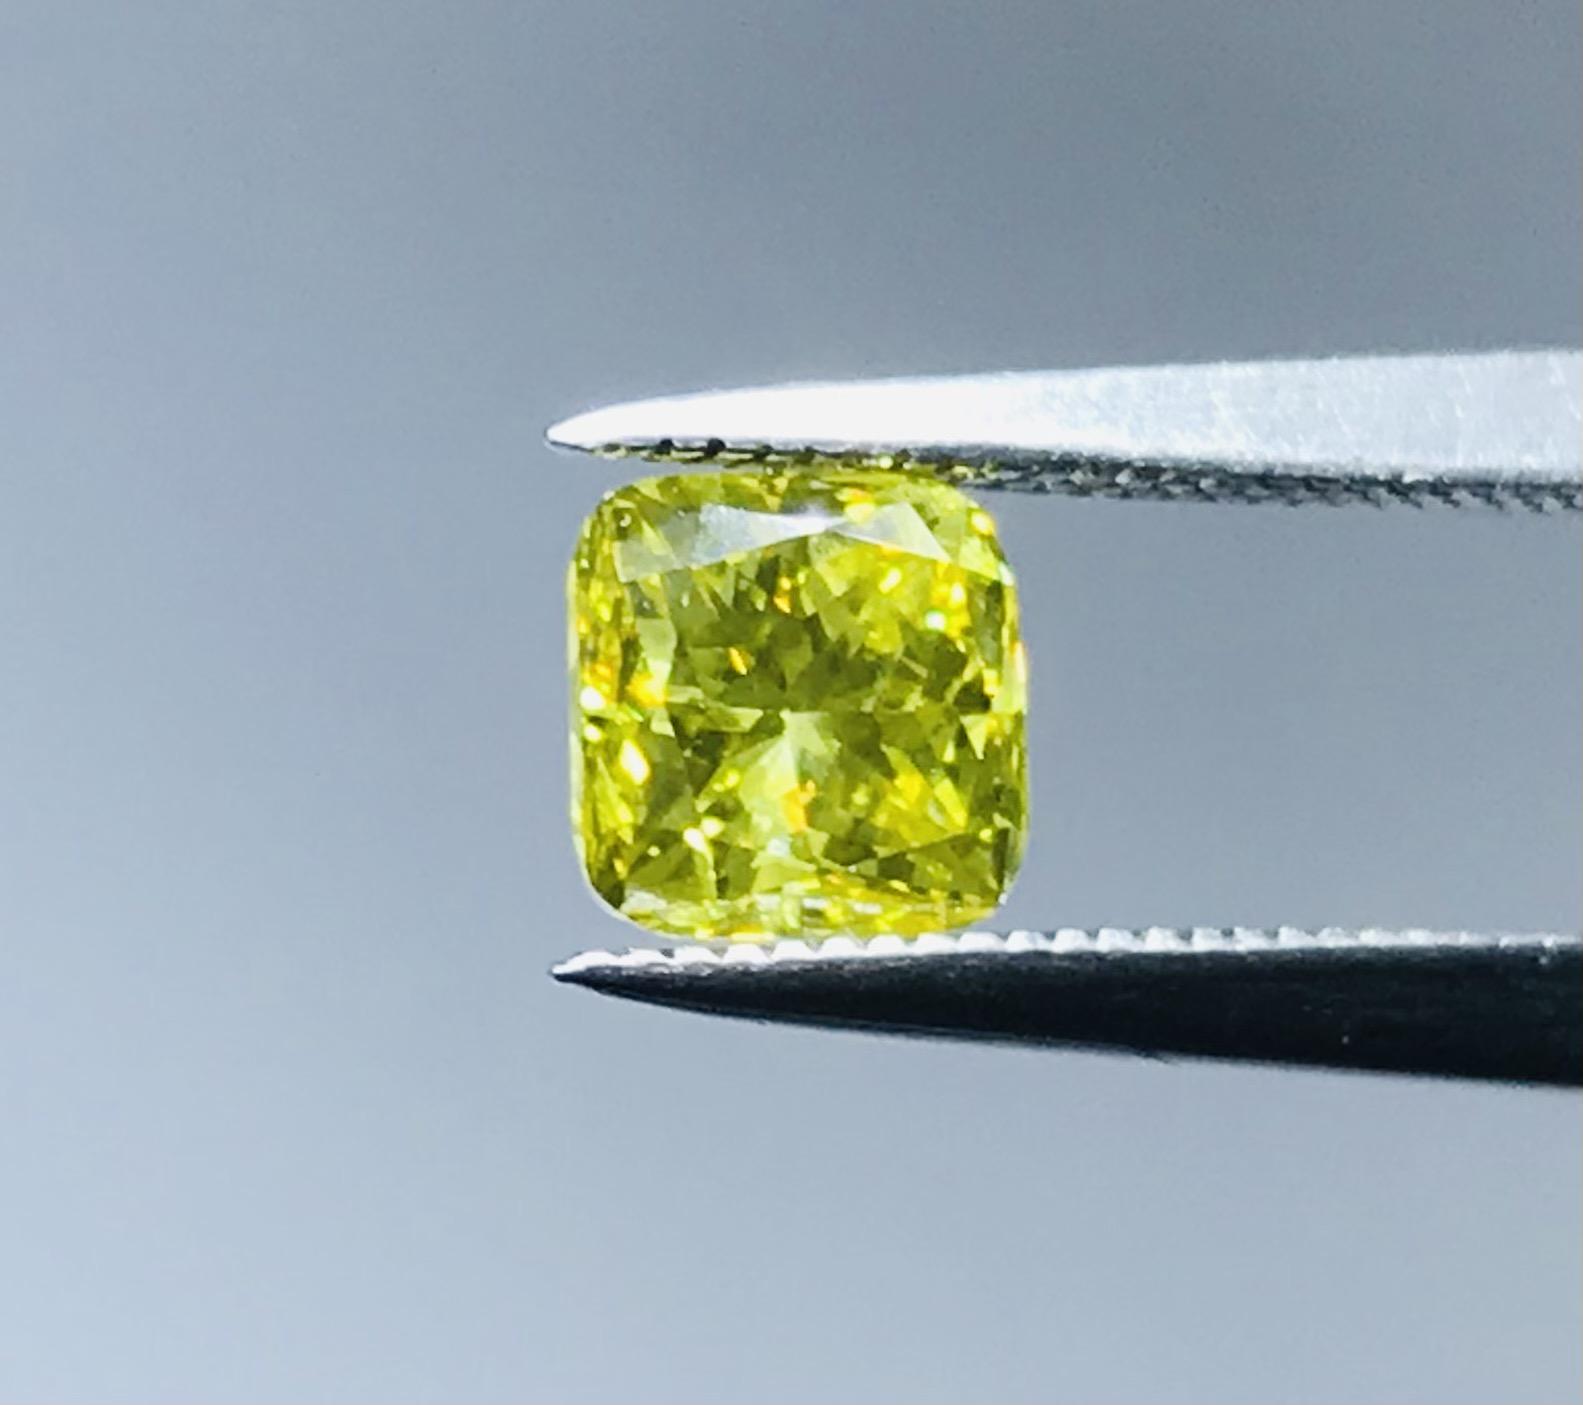 0.96 carat square cusion cut vibrant canary yellow diamond